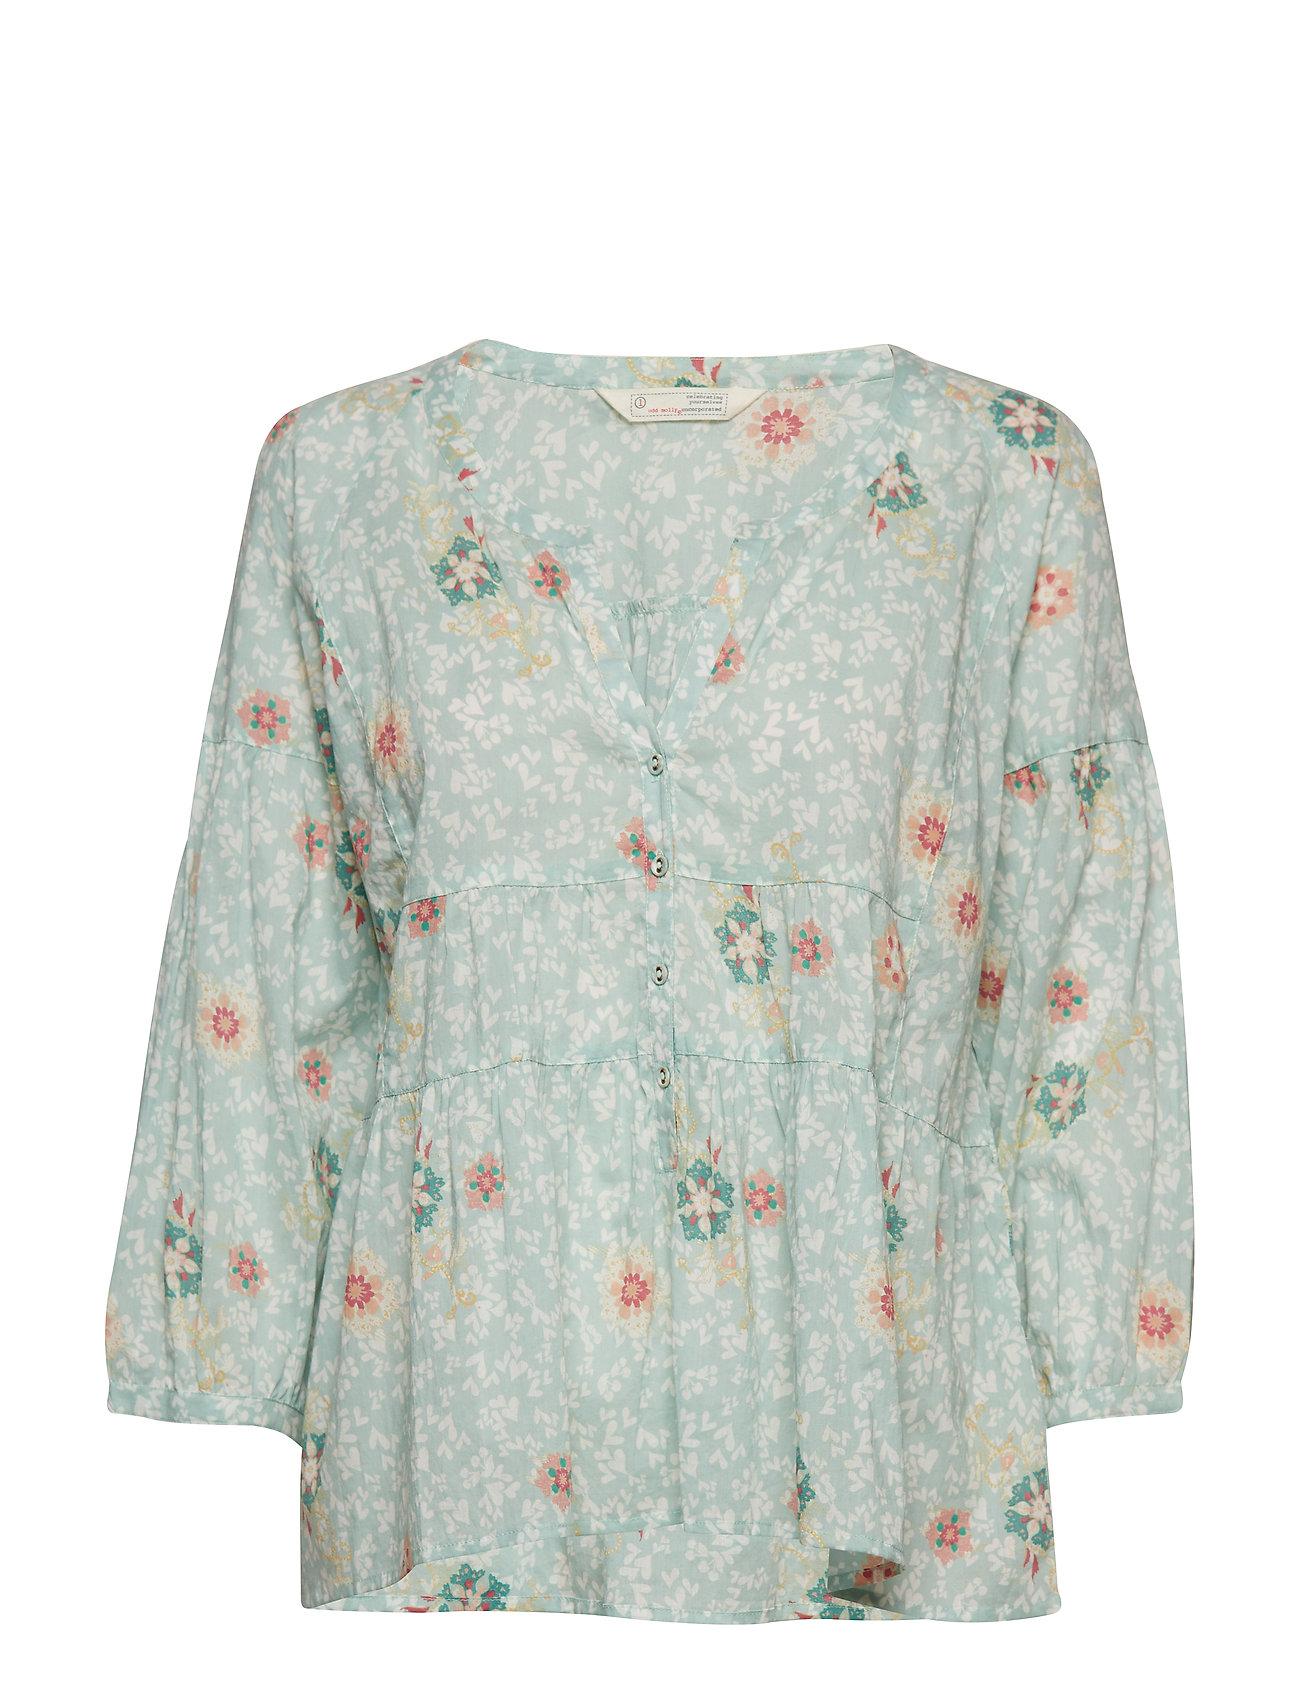 ODD MOLLY lush shake blouse - PISTACCIO